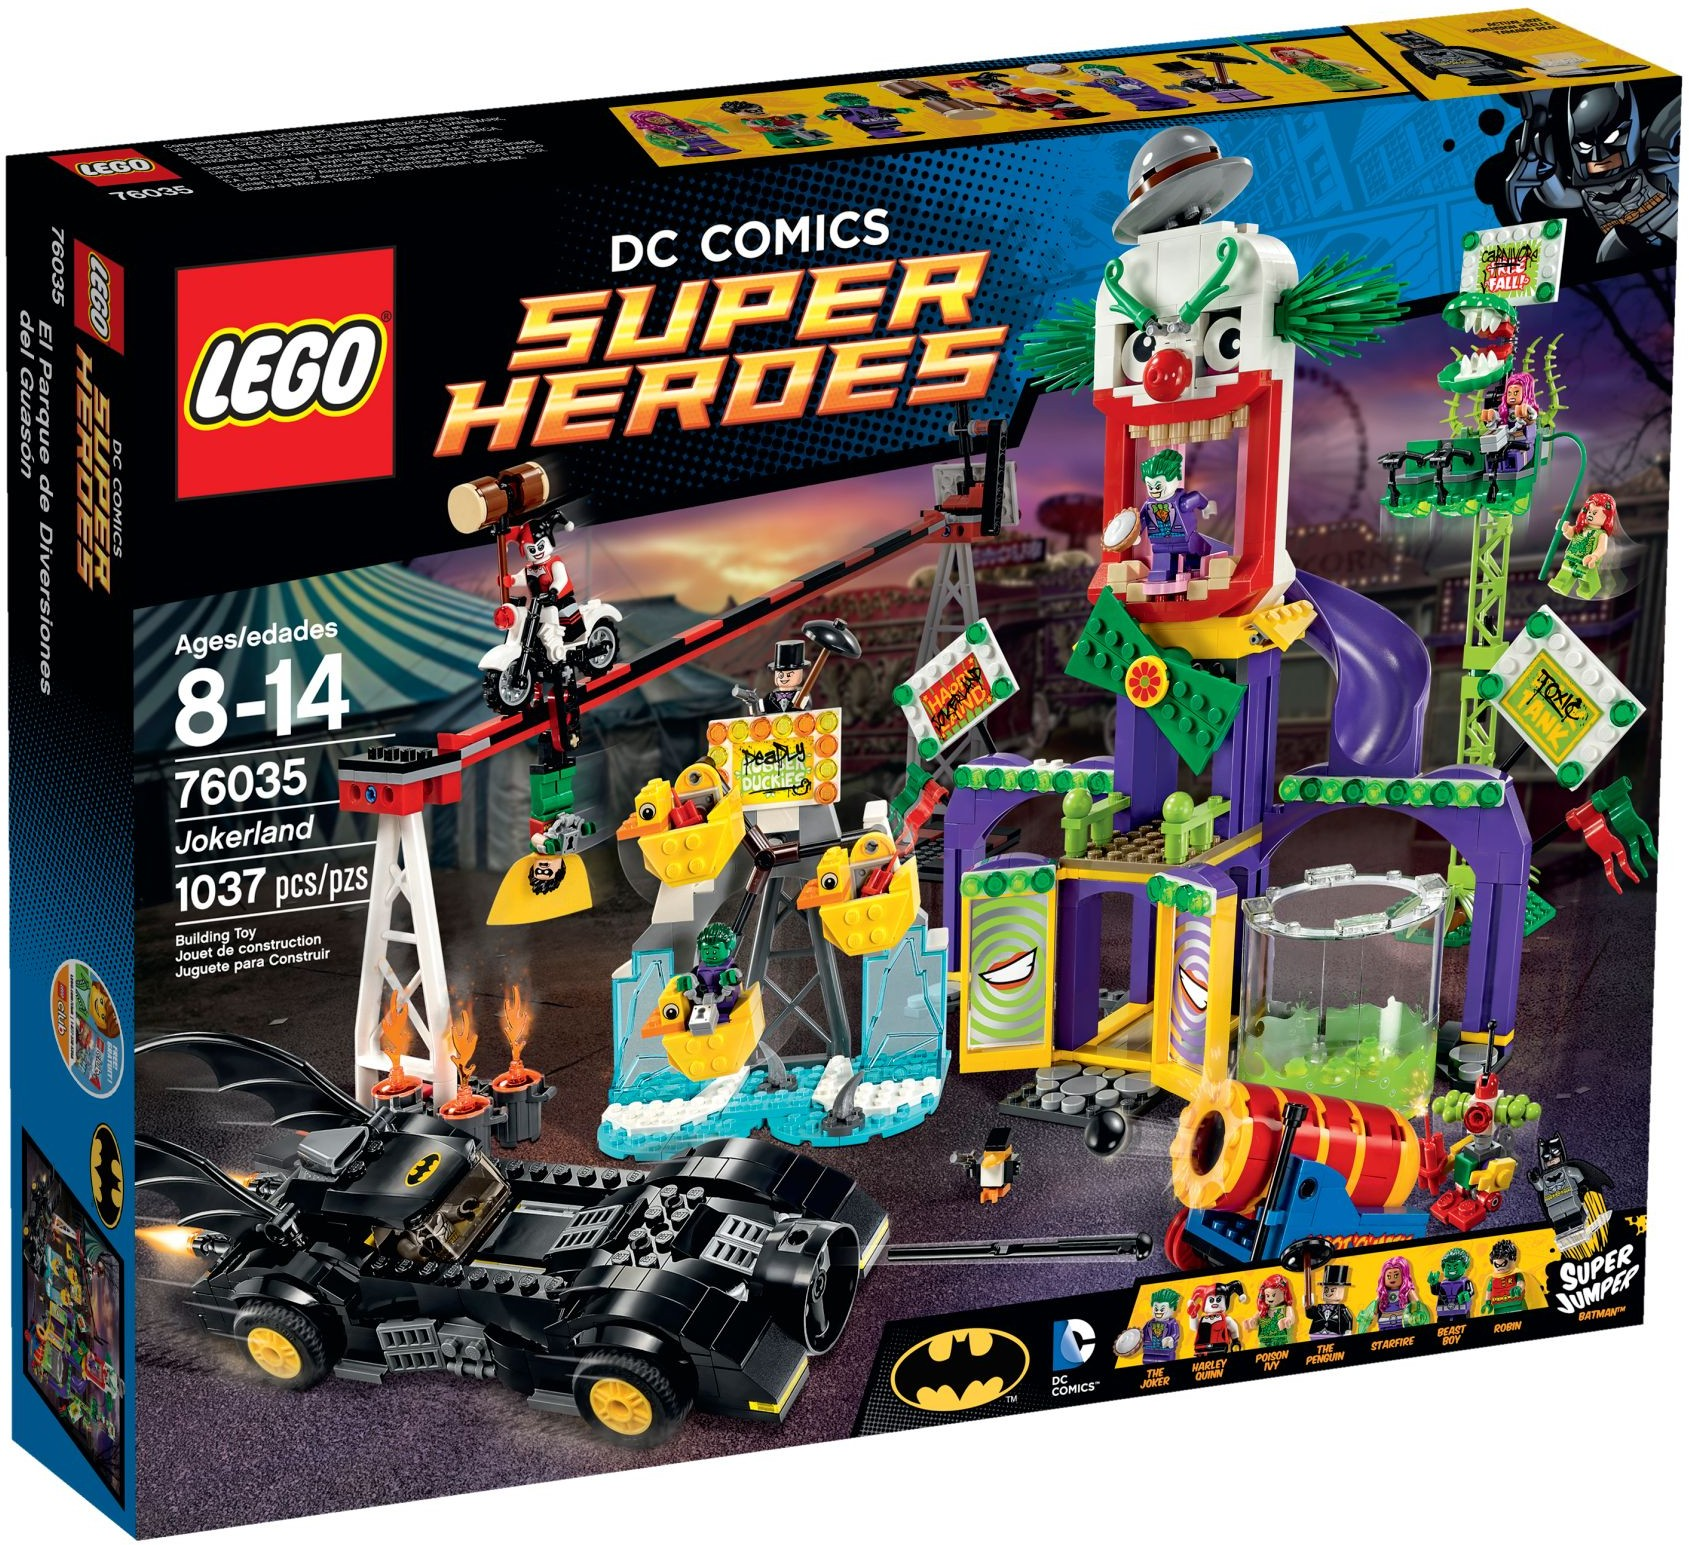 LEGO BATMAN 76035 Jokerland Robin Penguin StarFire